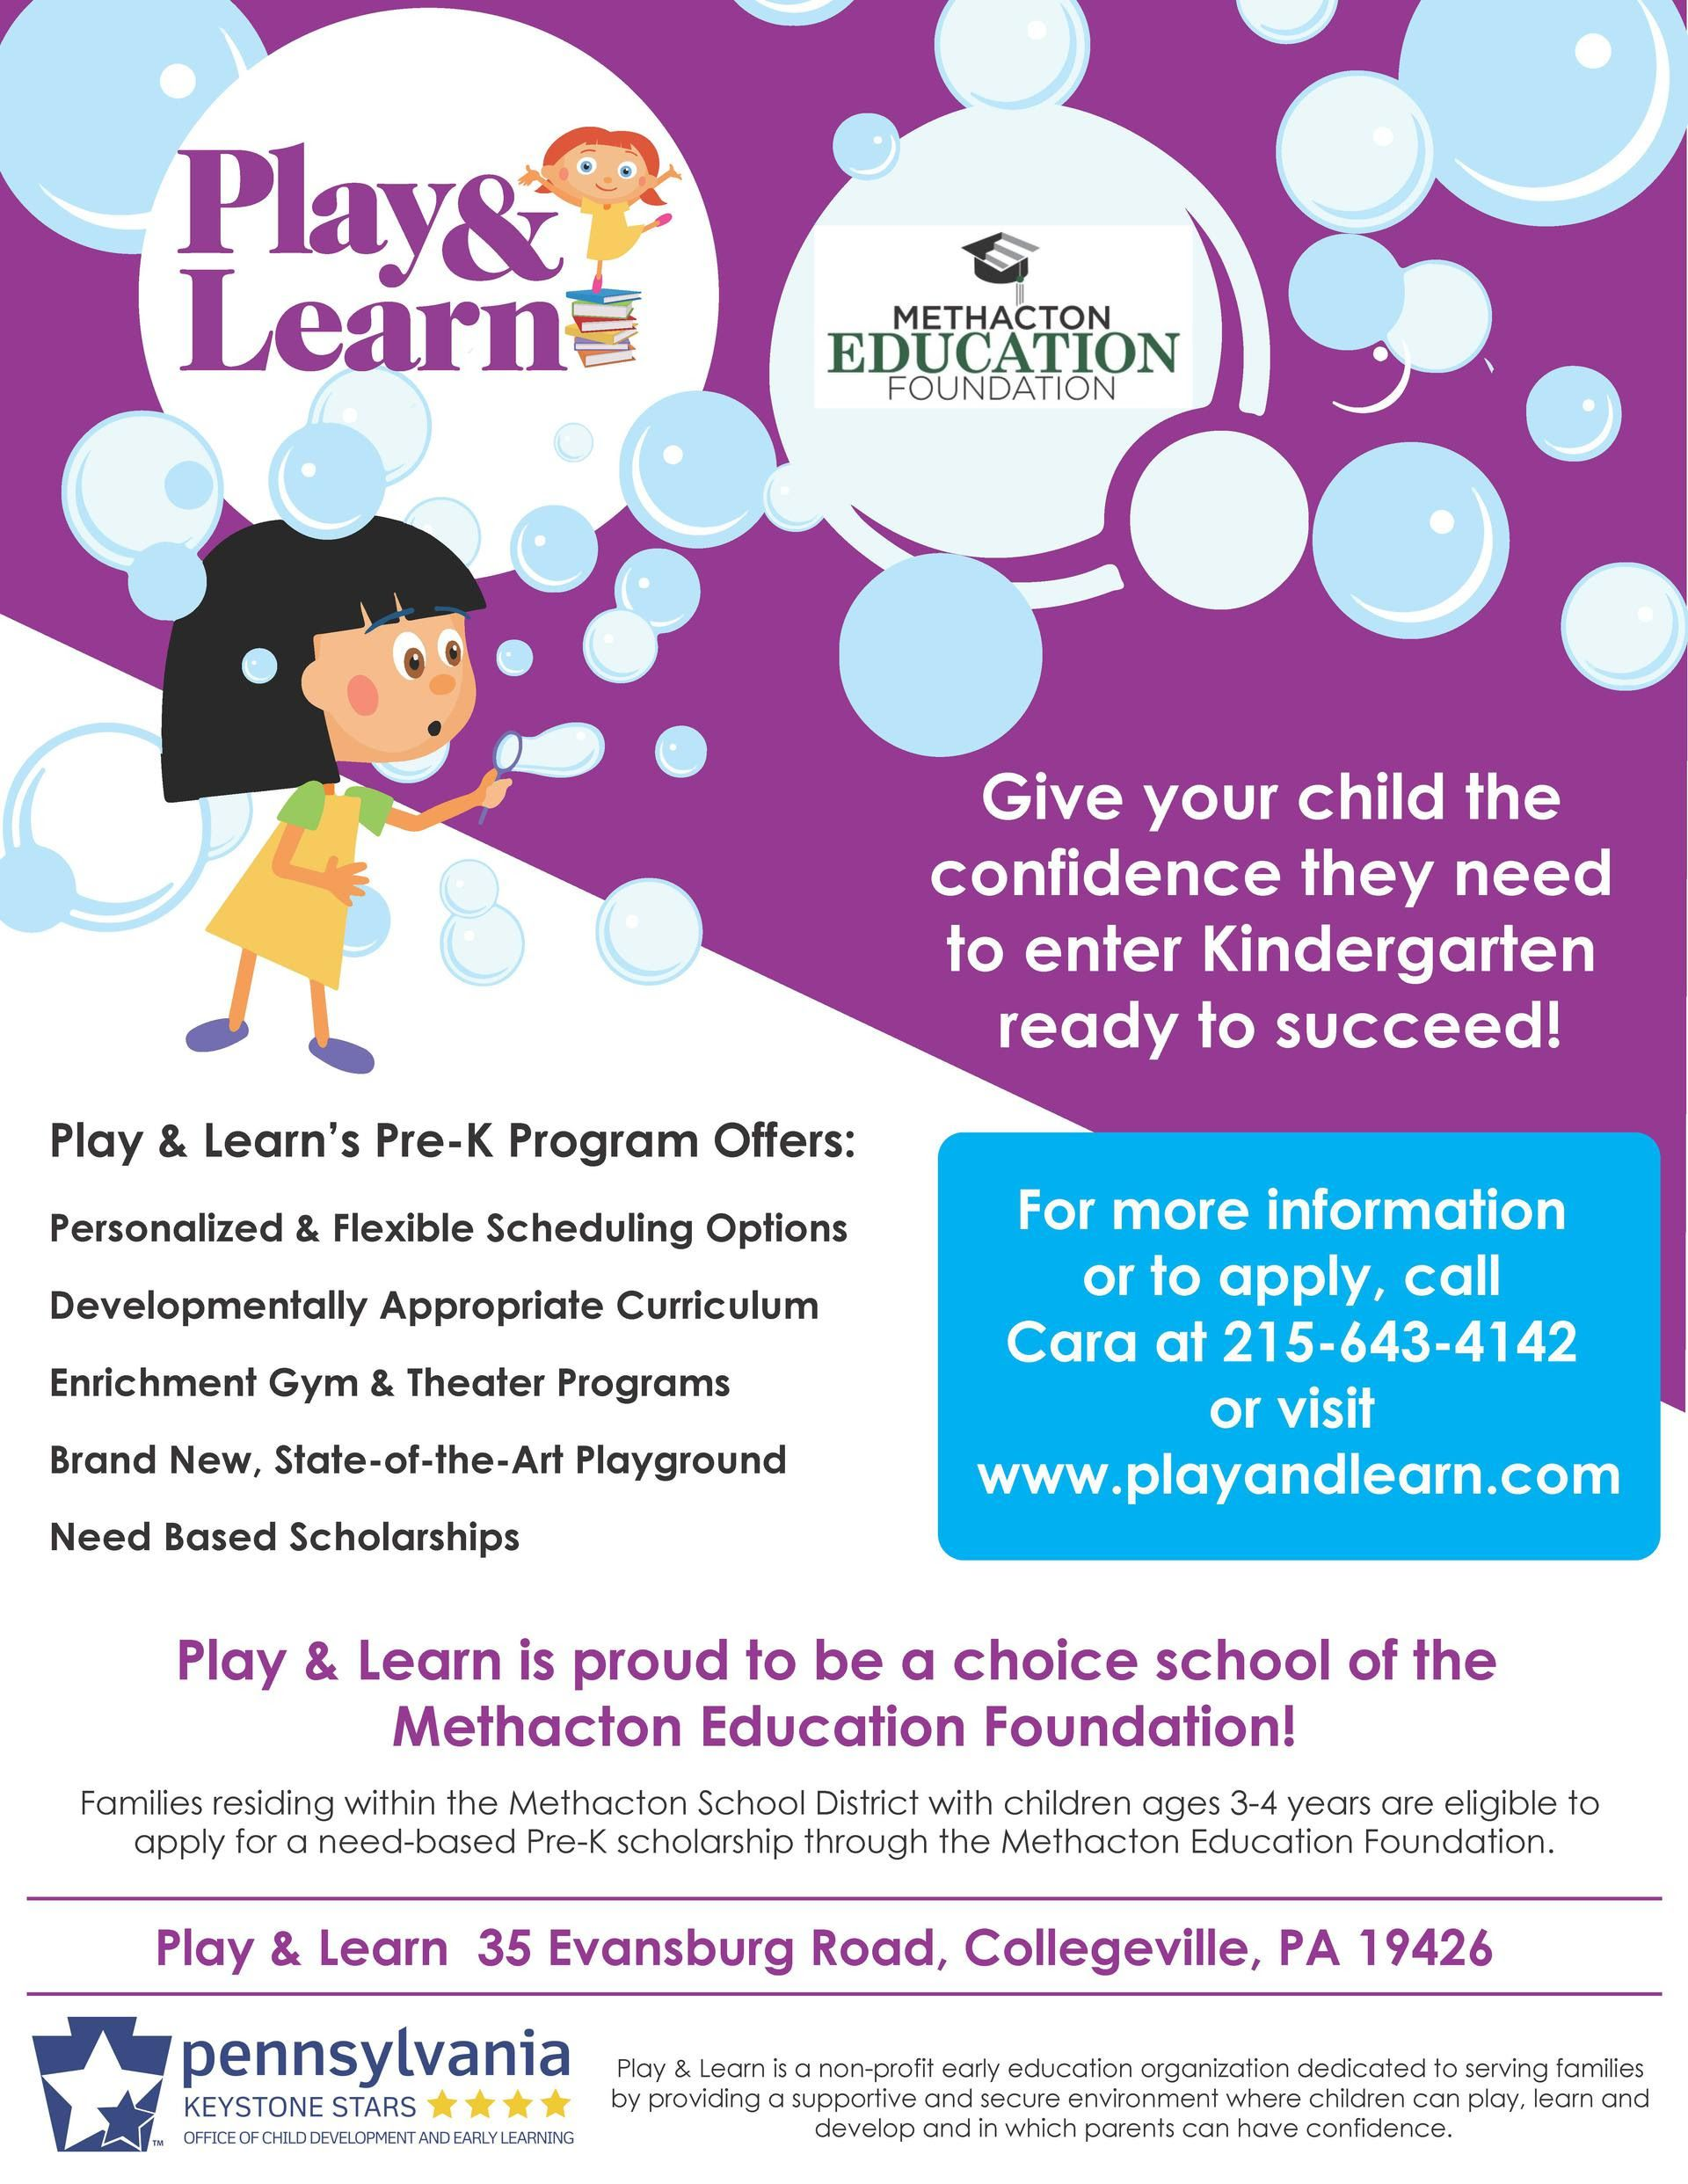 Need-Based Pre-K Scholarships